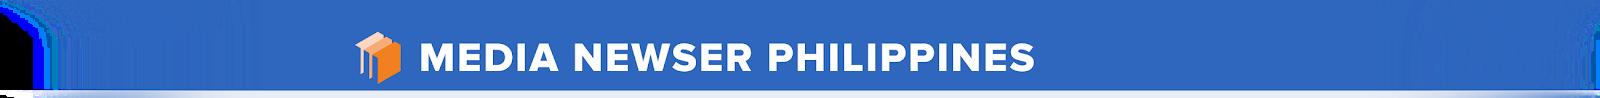 Media Newser Philippines   |   News On Philippine TV News